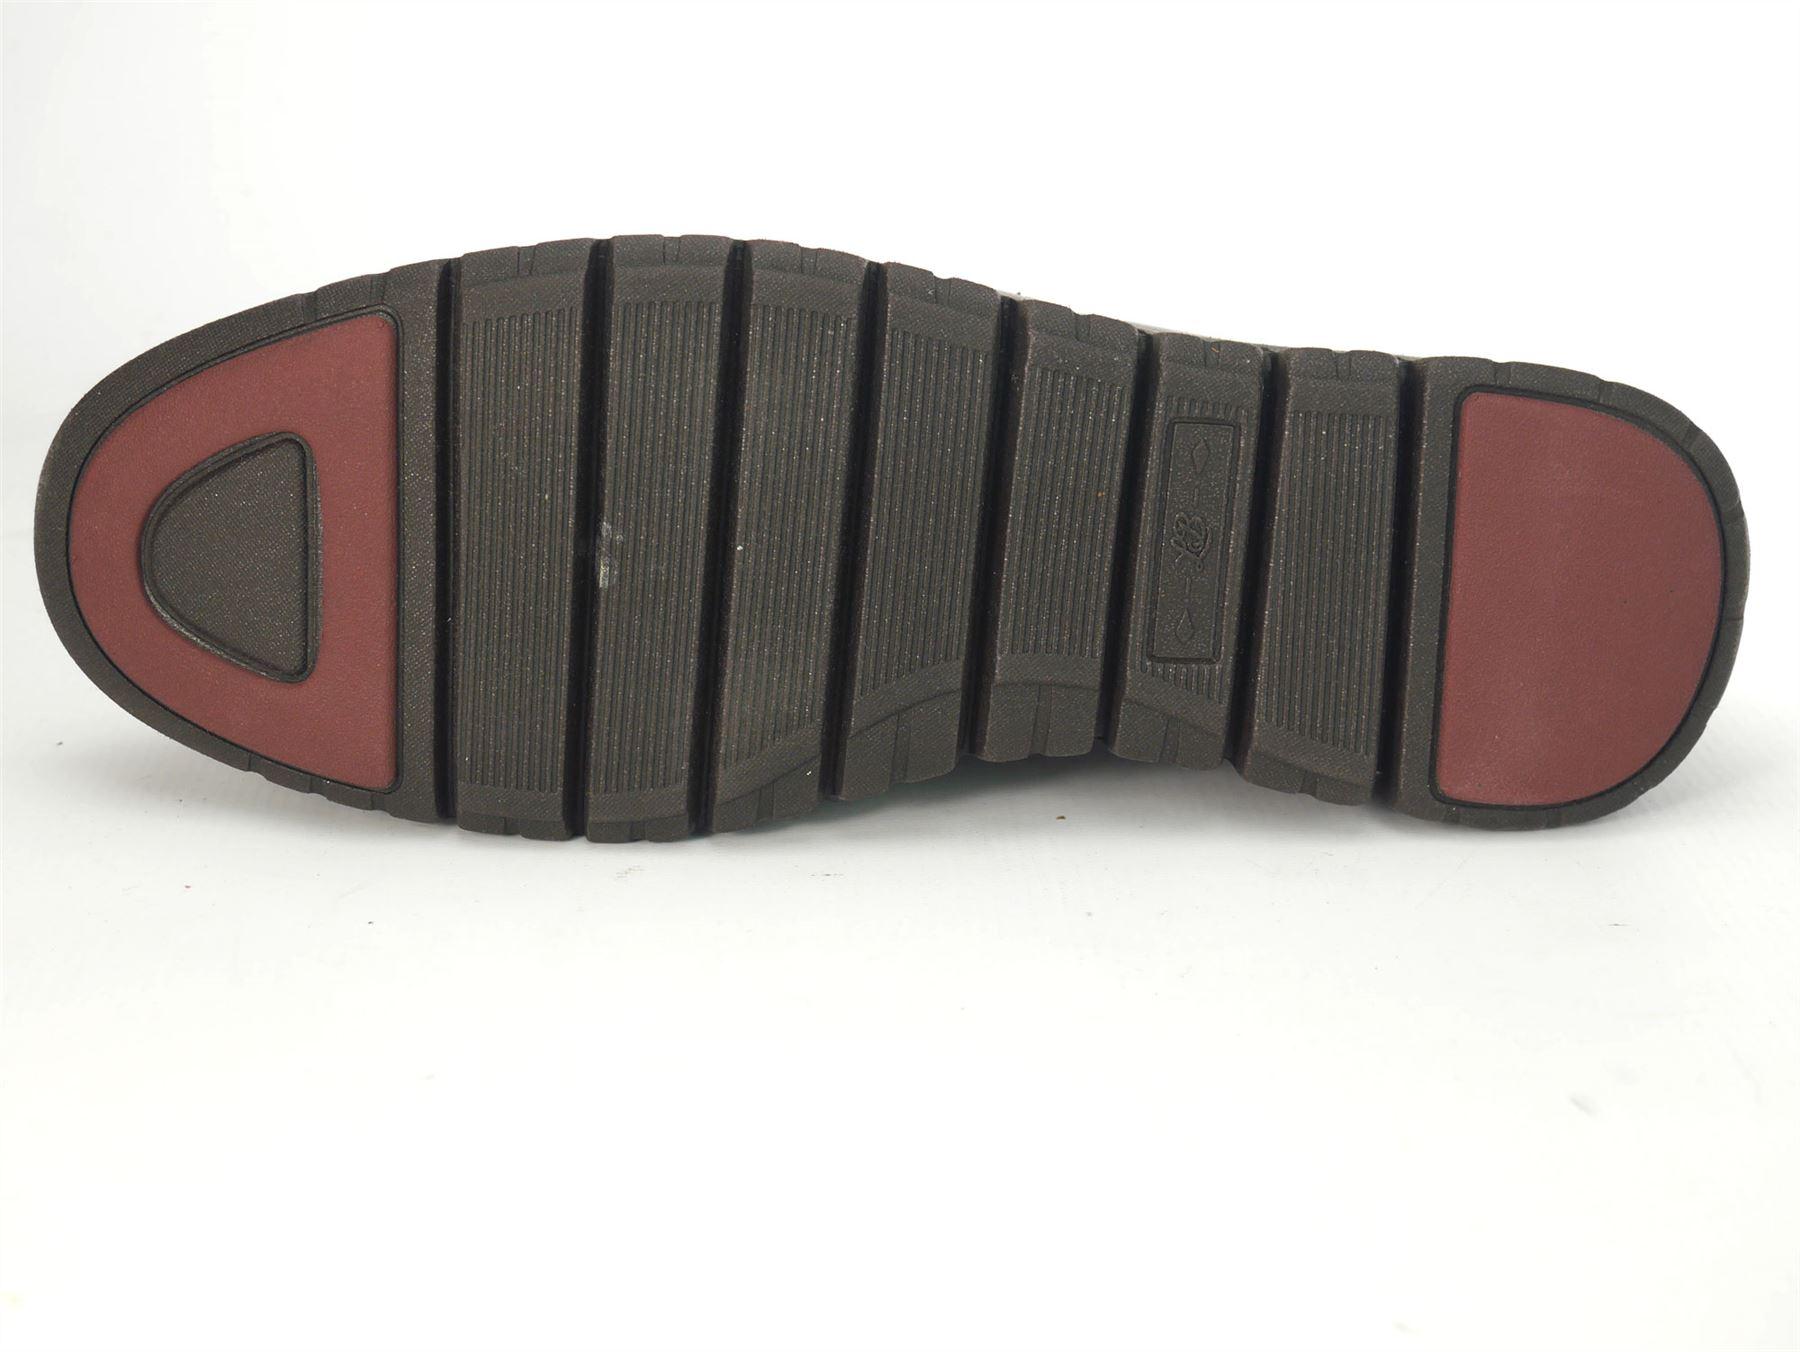 flexible  chaussures gatz mocassin en cuir léger flexible  homme chaussures abdc63